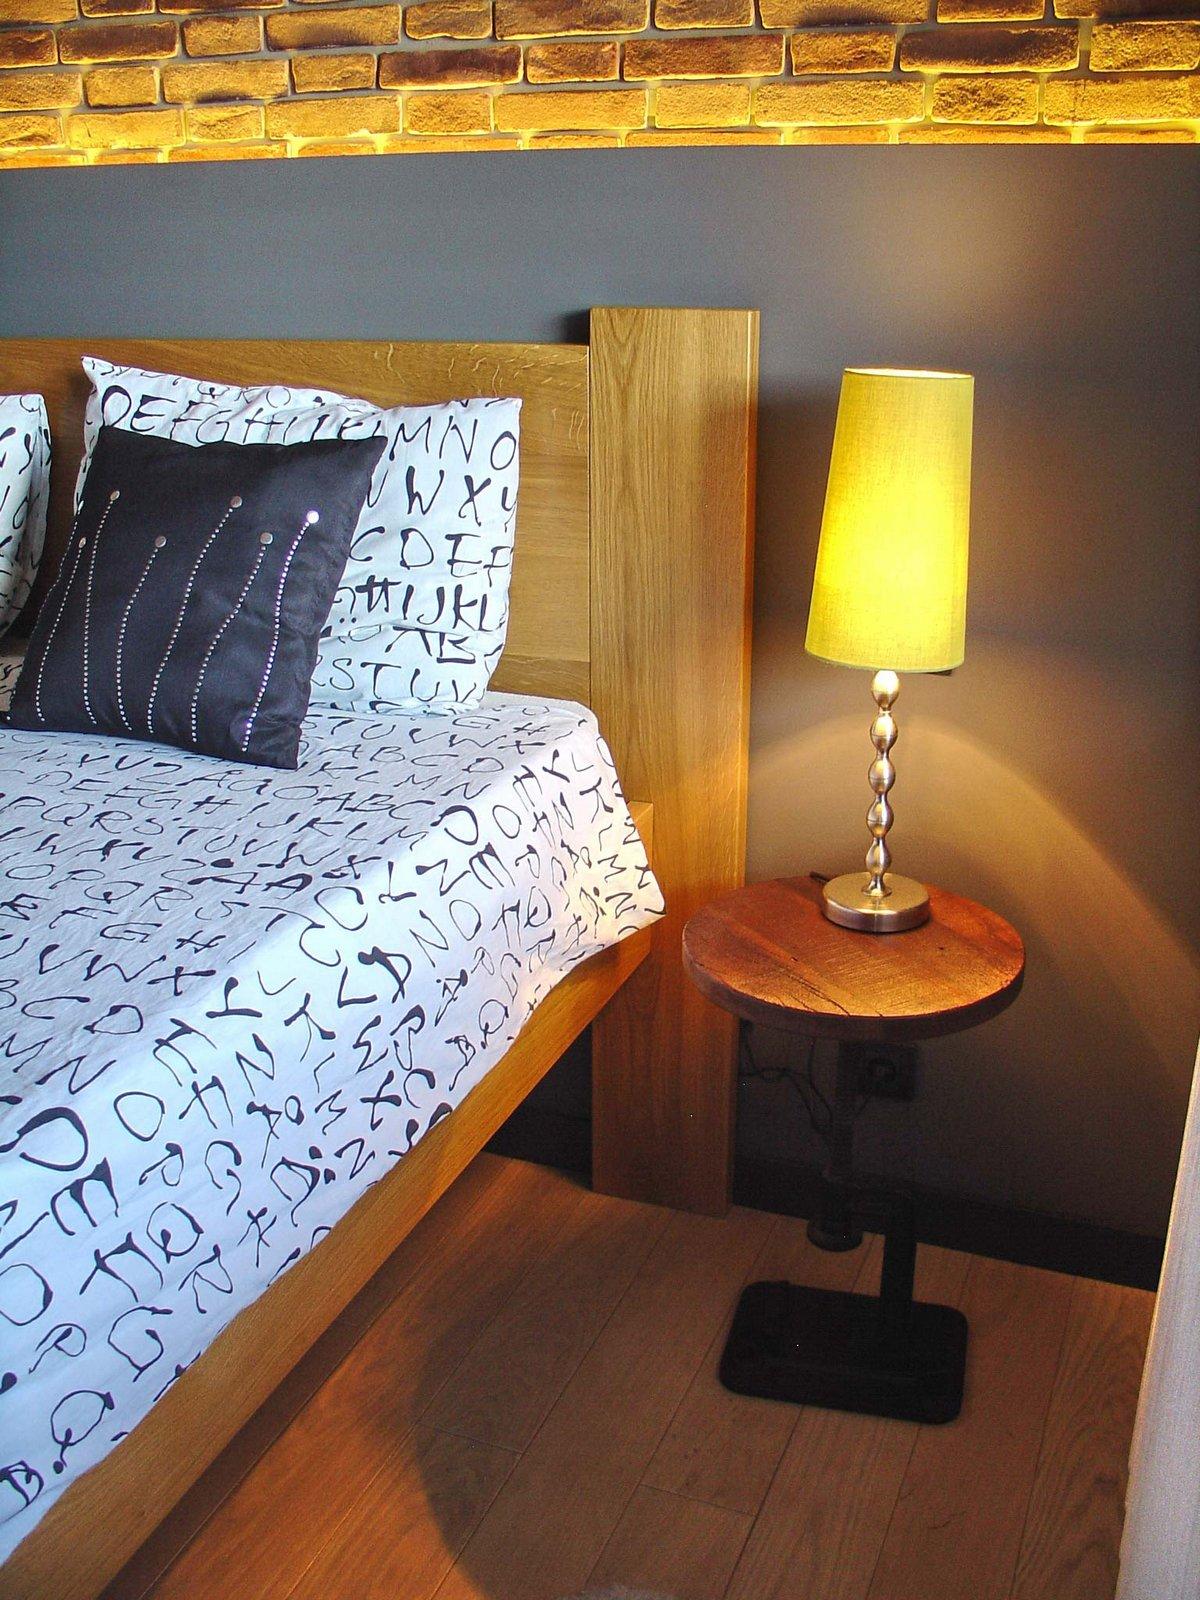 OPENstudio, квартира в Сербии, дизайн интерьера квартиры, дизайн трехкомнатной квартиры, яркий дизайн интерьера, бетон в интерьере квартиры